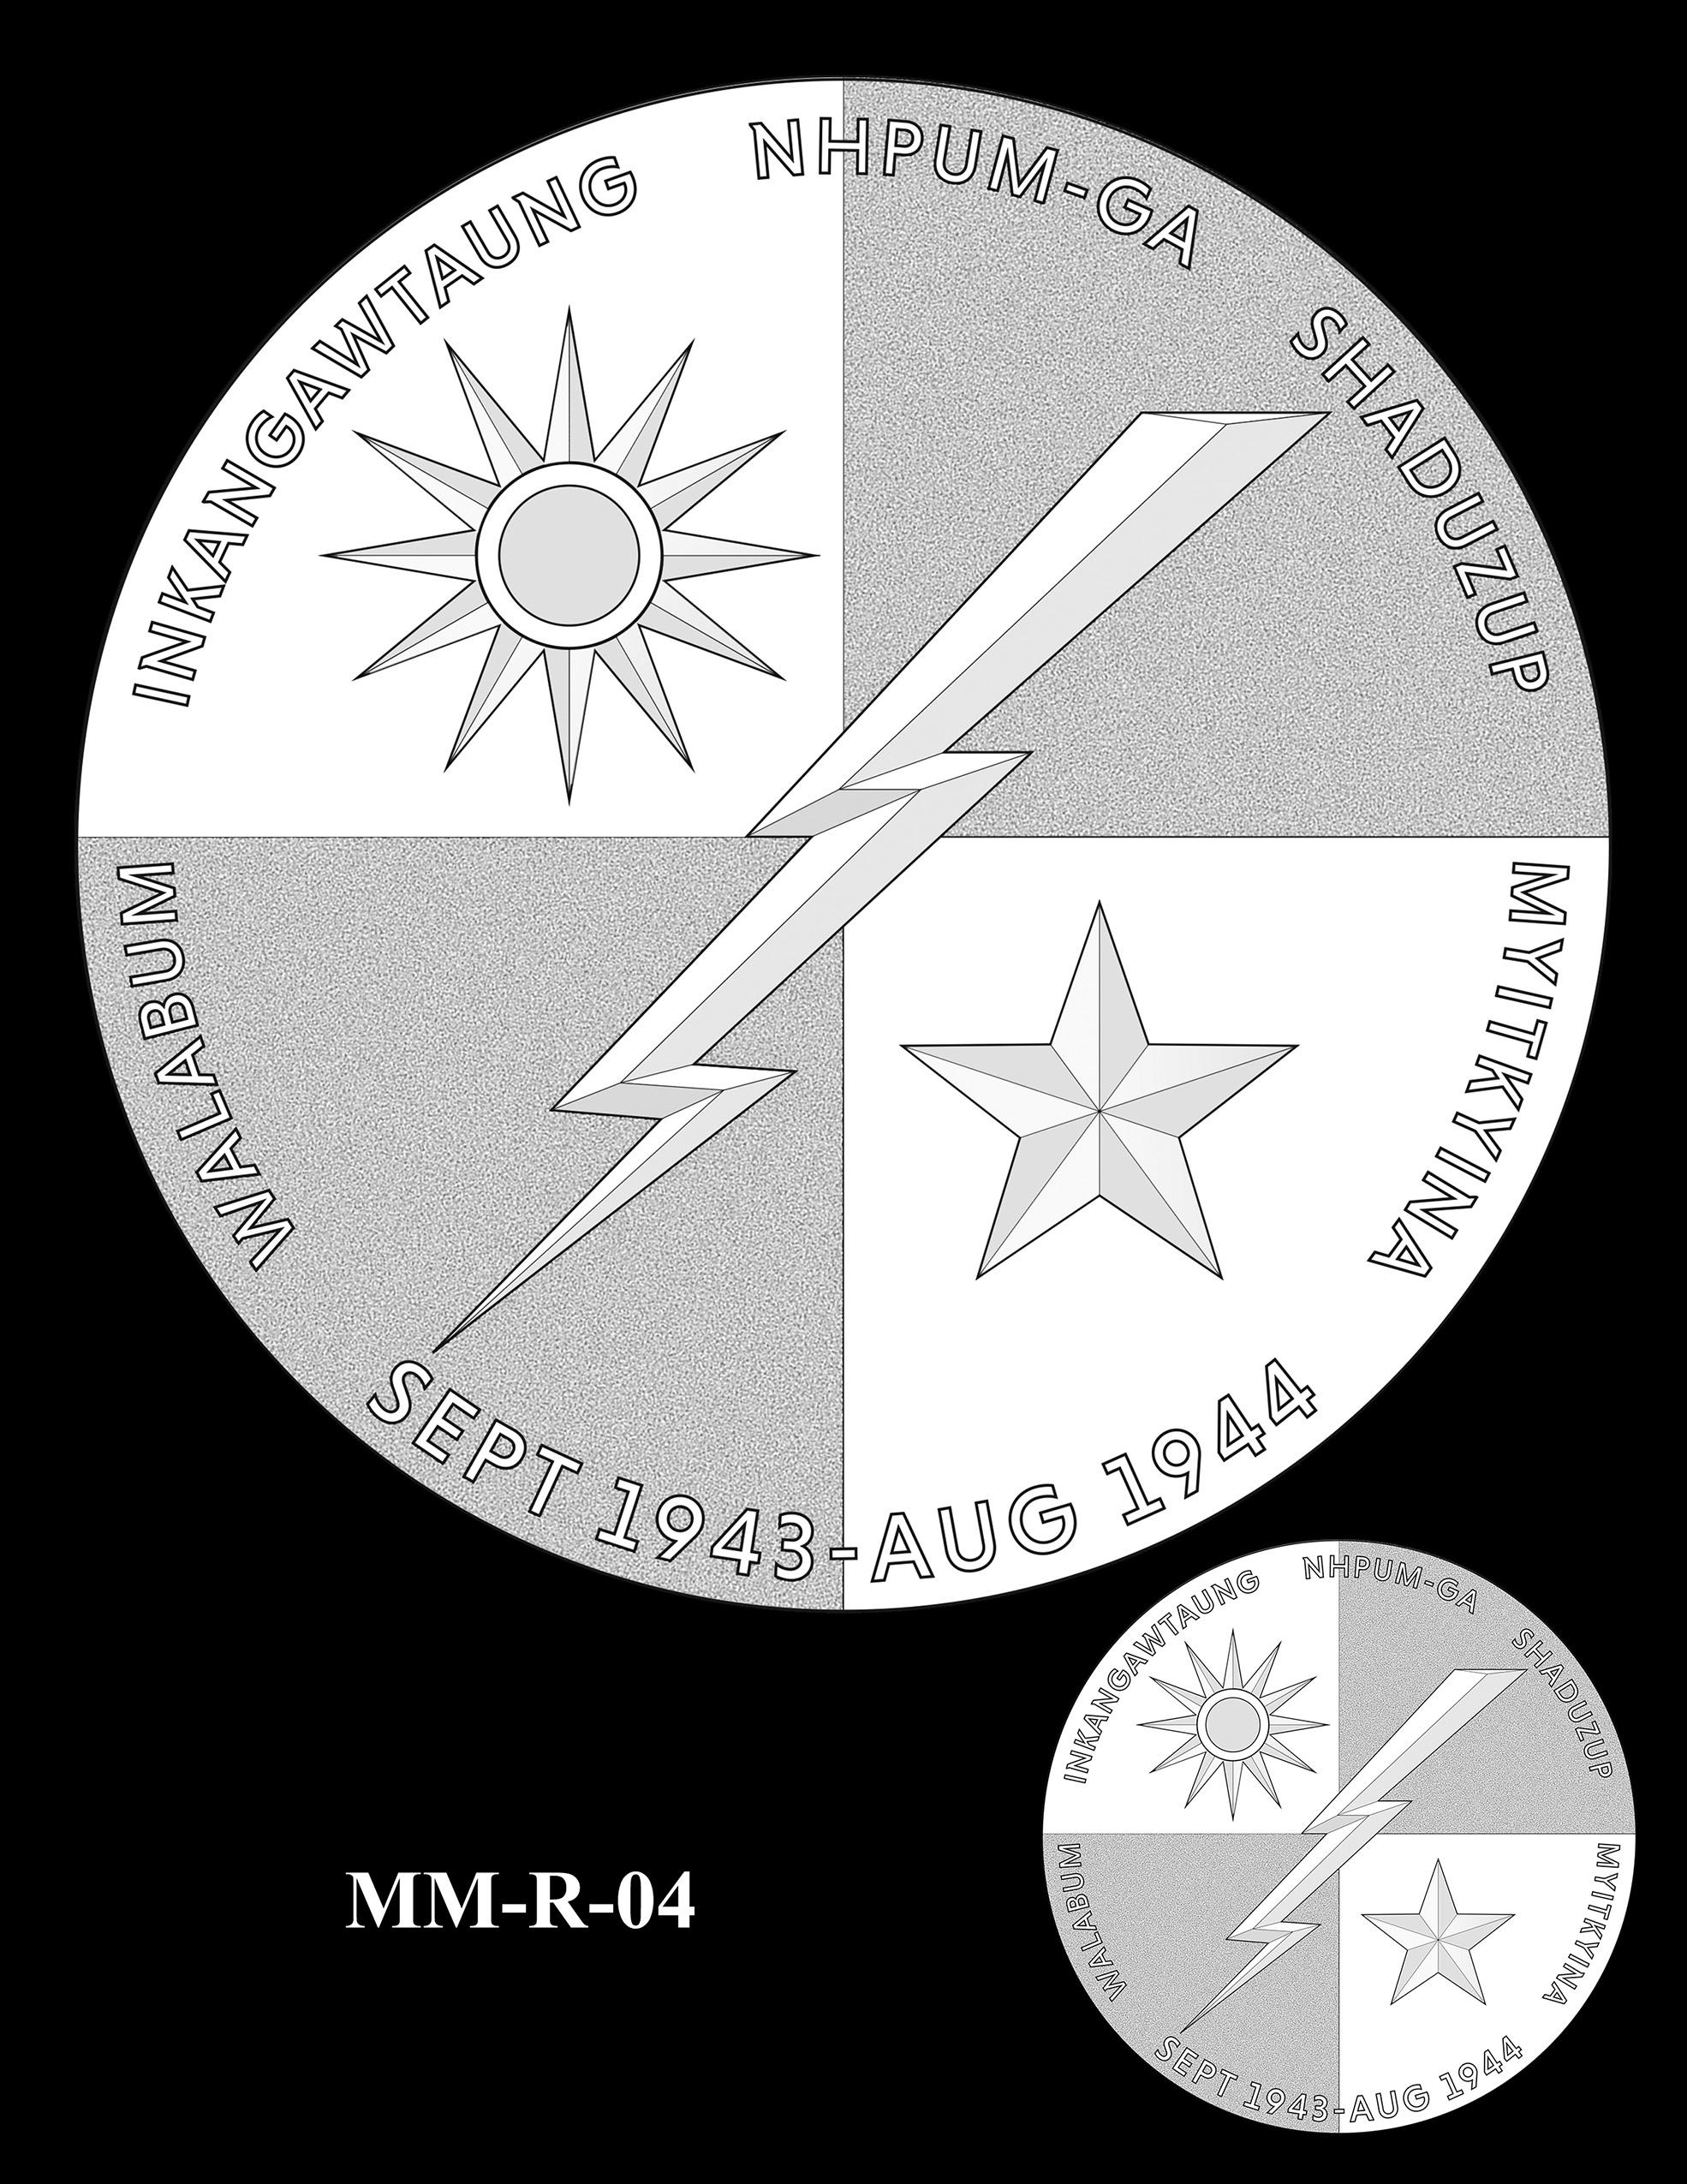 MM-R-04 -- Merrill's Marauders Congressional Gold Medal